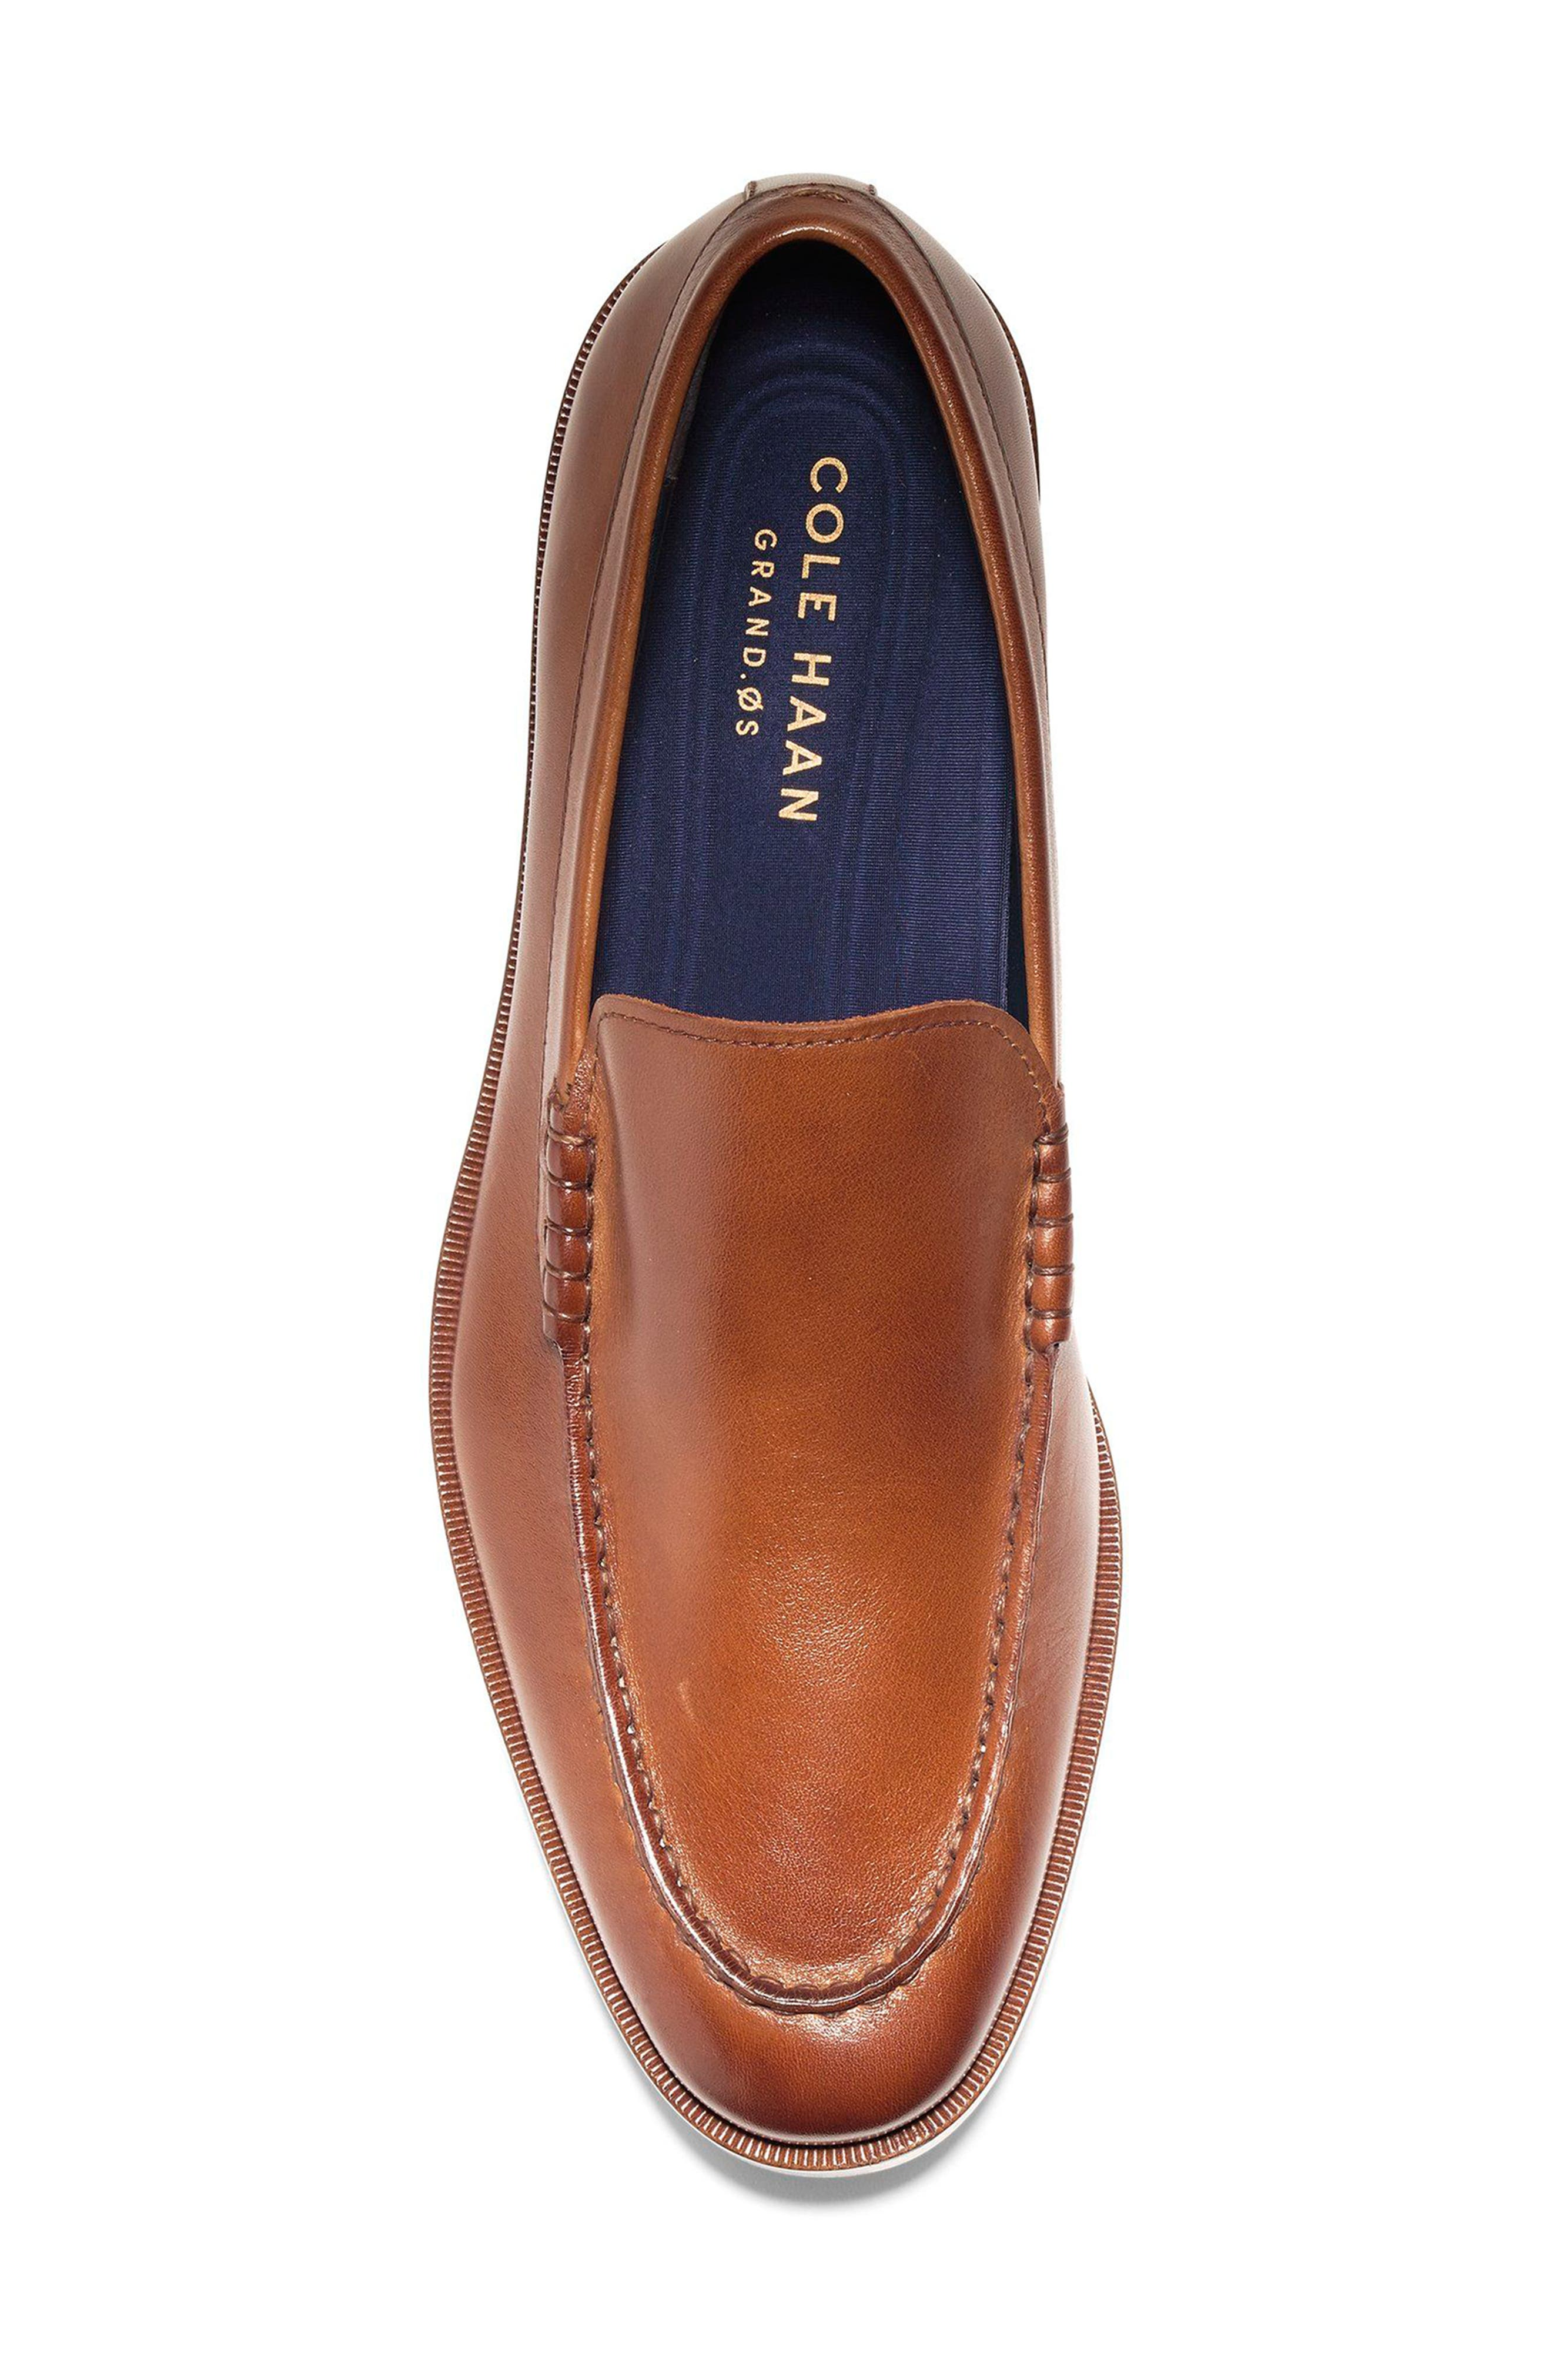 Hamilton Grand Venetian Loafer,                             Alternate thumbnail 5, color,                             British Tan